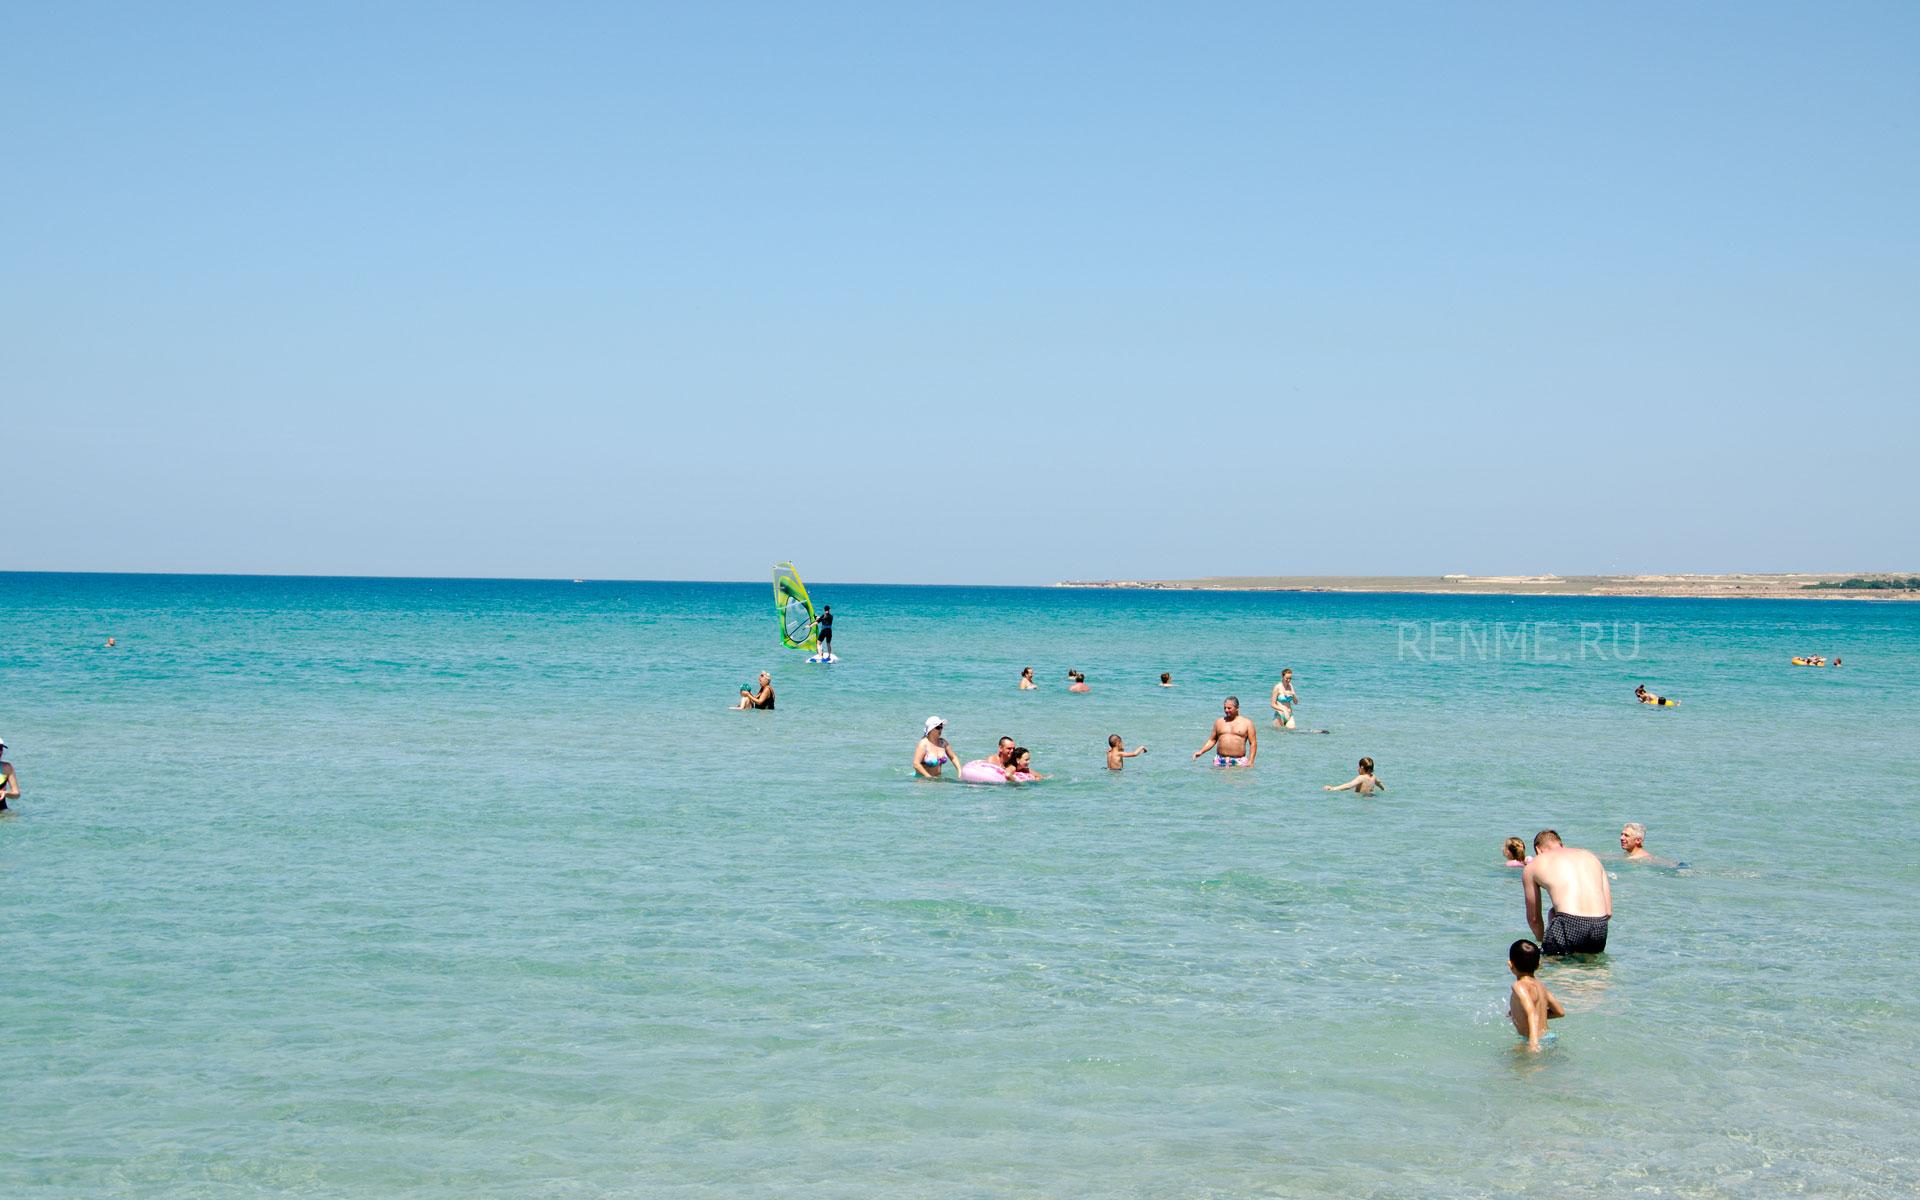 Море в Оленевке. Фото Оленевки